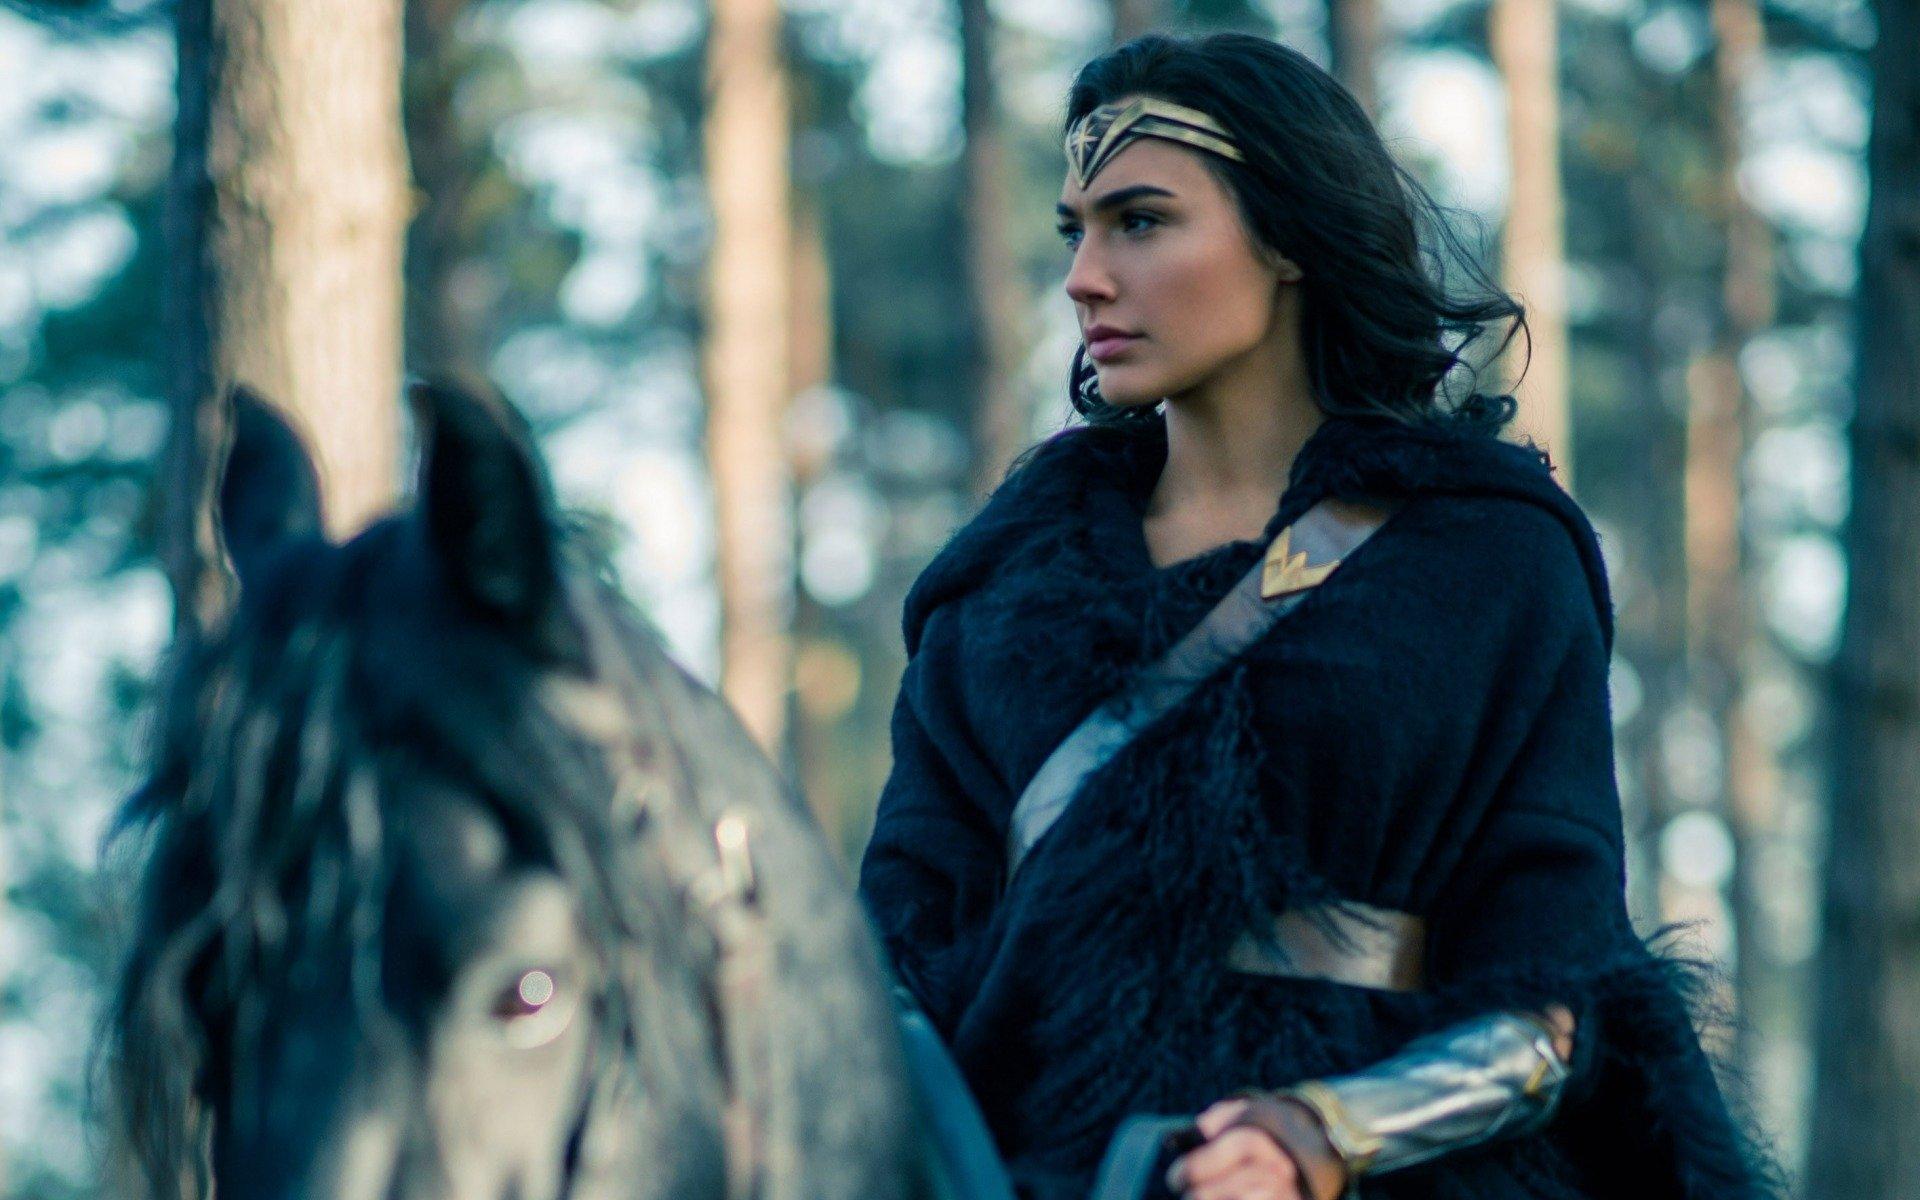 Hd wallpaper wonder woman - Hd Wallpaper Background Id 783603 1920x1200 Movie Wonder Woman